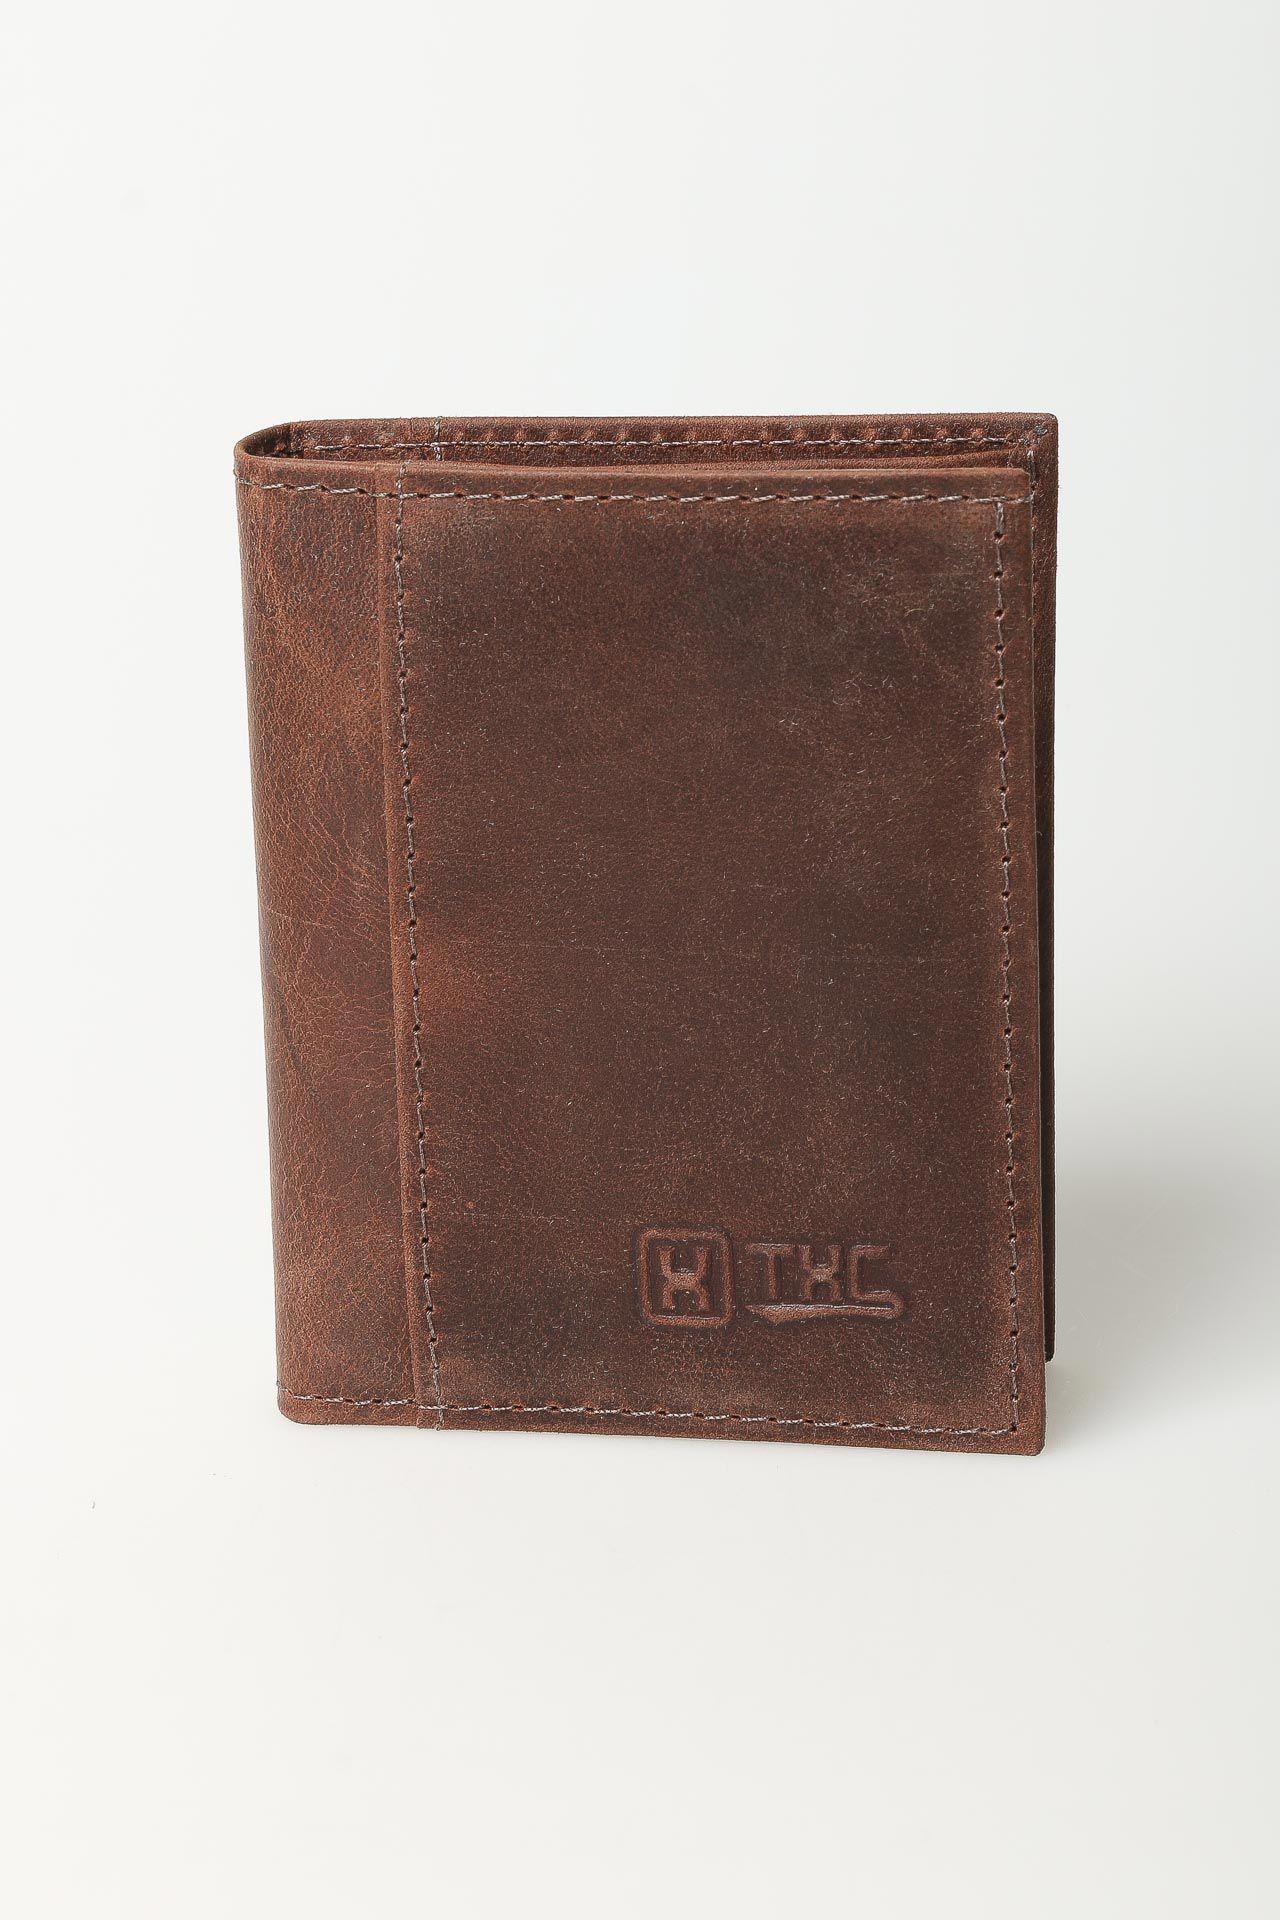 Carteira TXC 11026